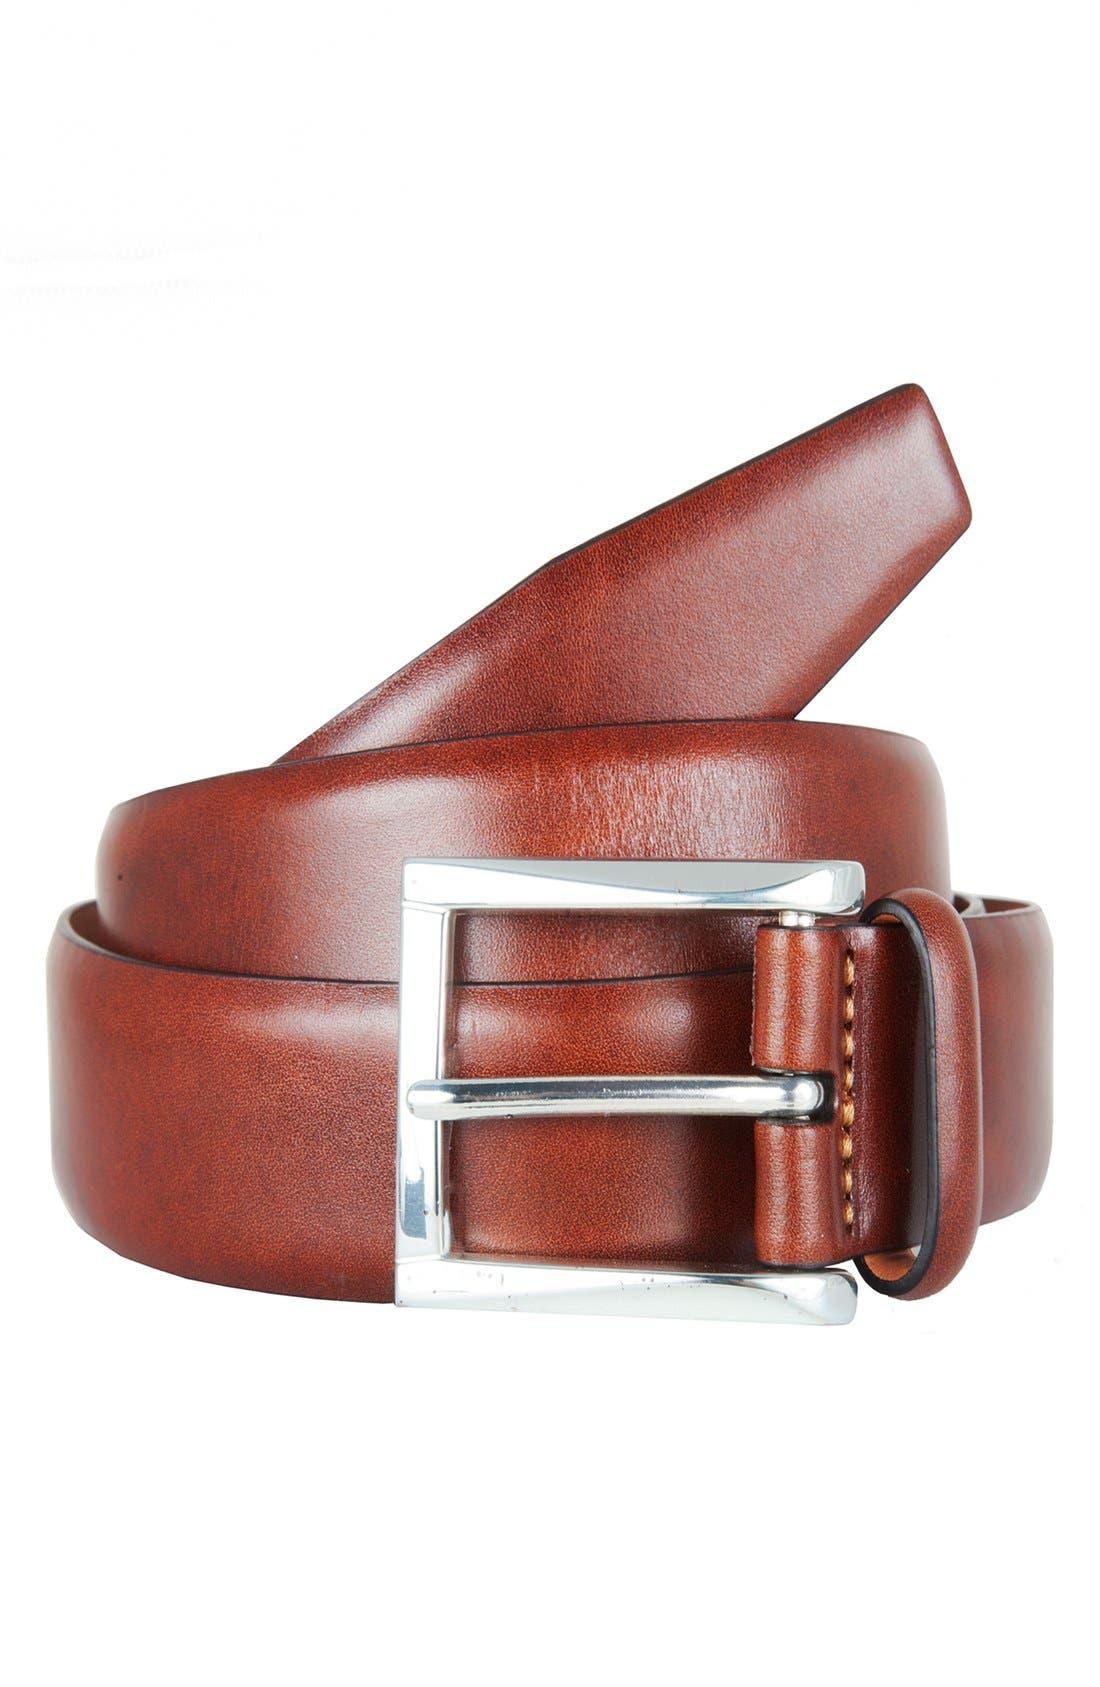 Alternate Image 1 Selected - Trafalgar 'Broderick' Belt